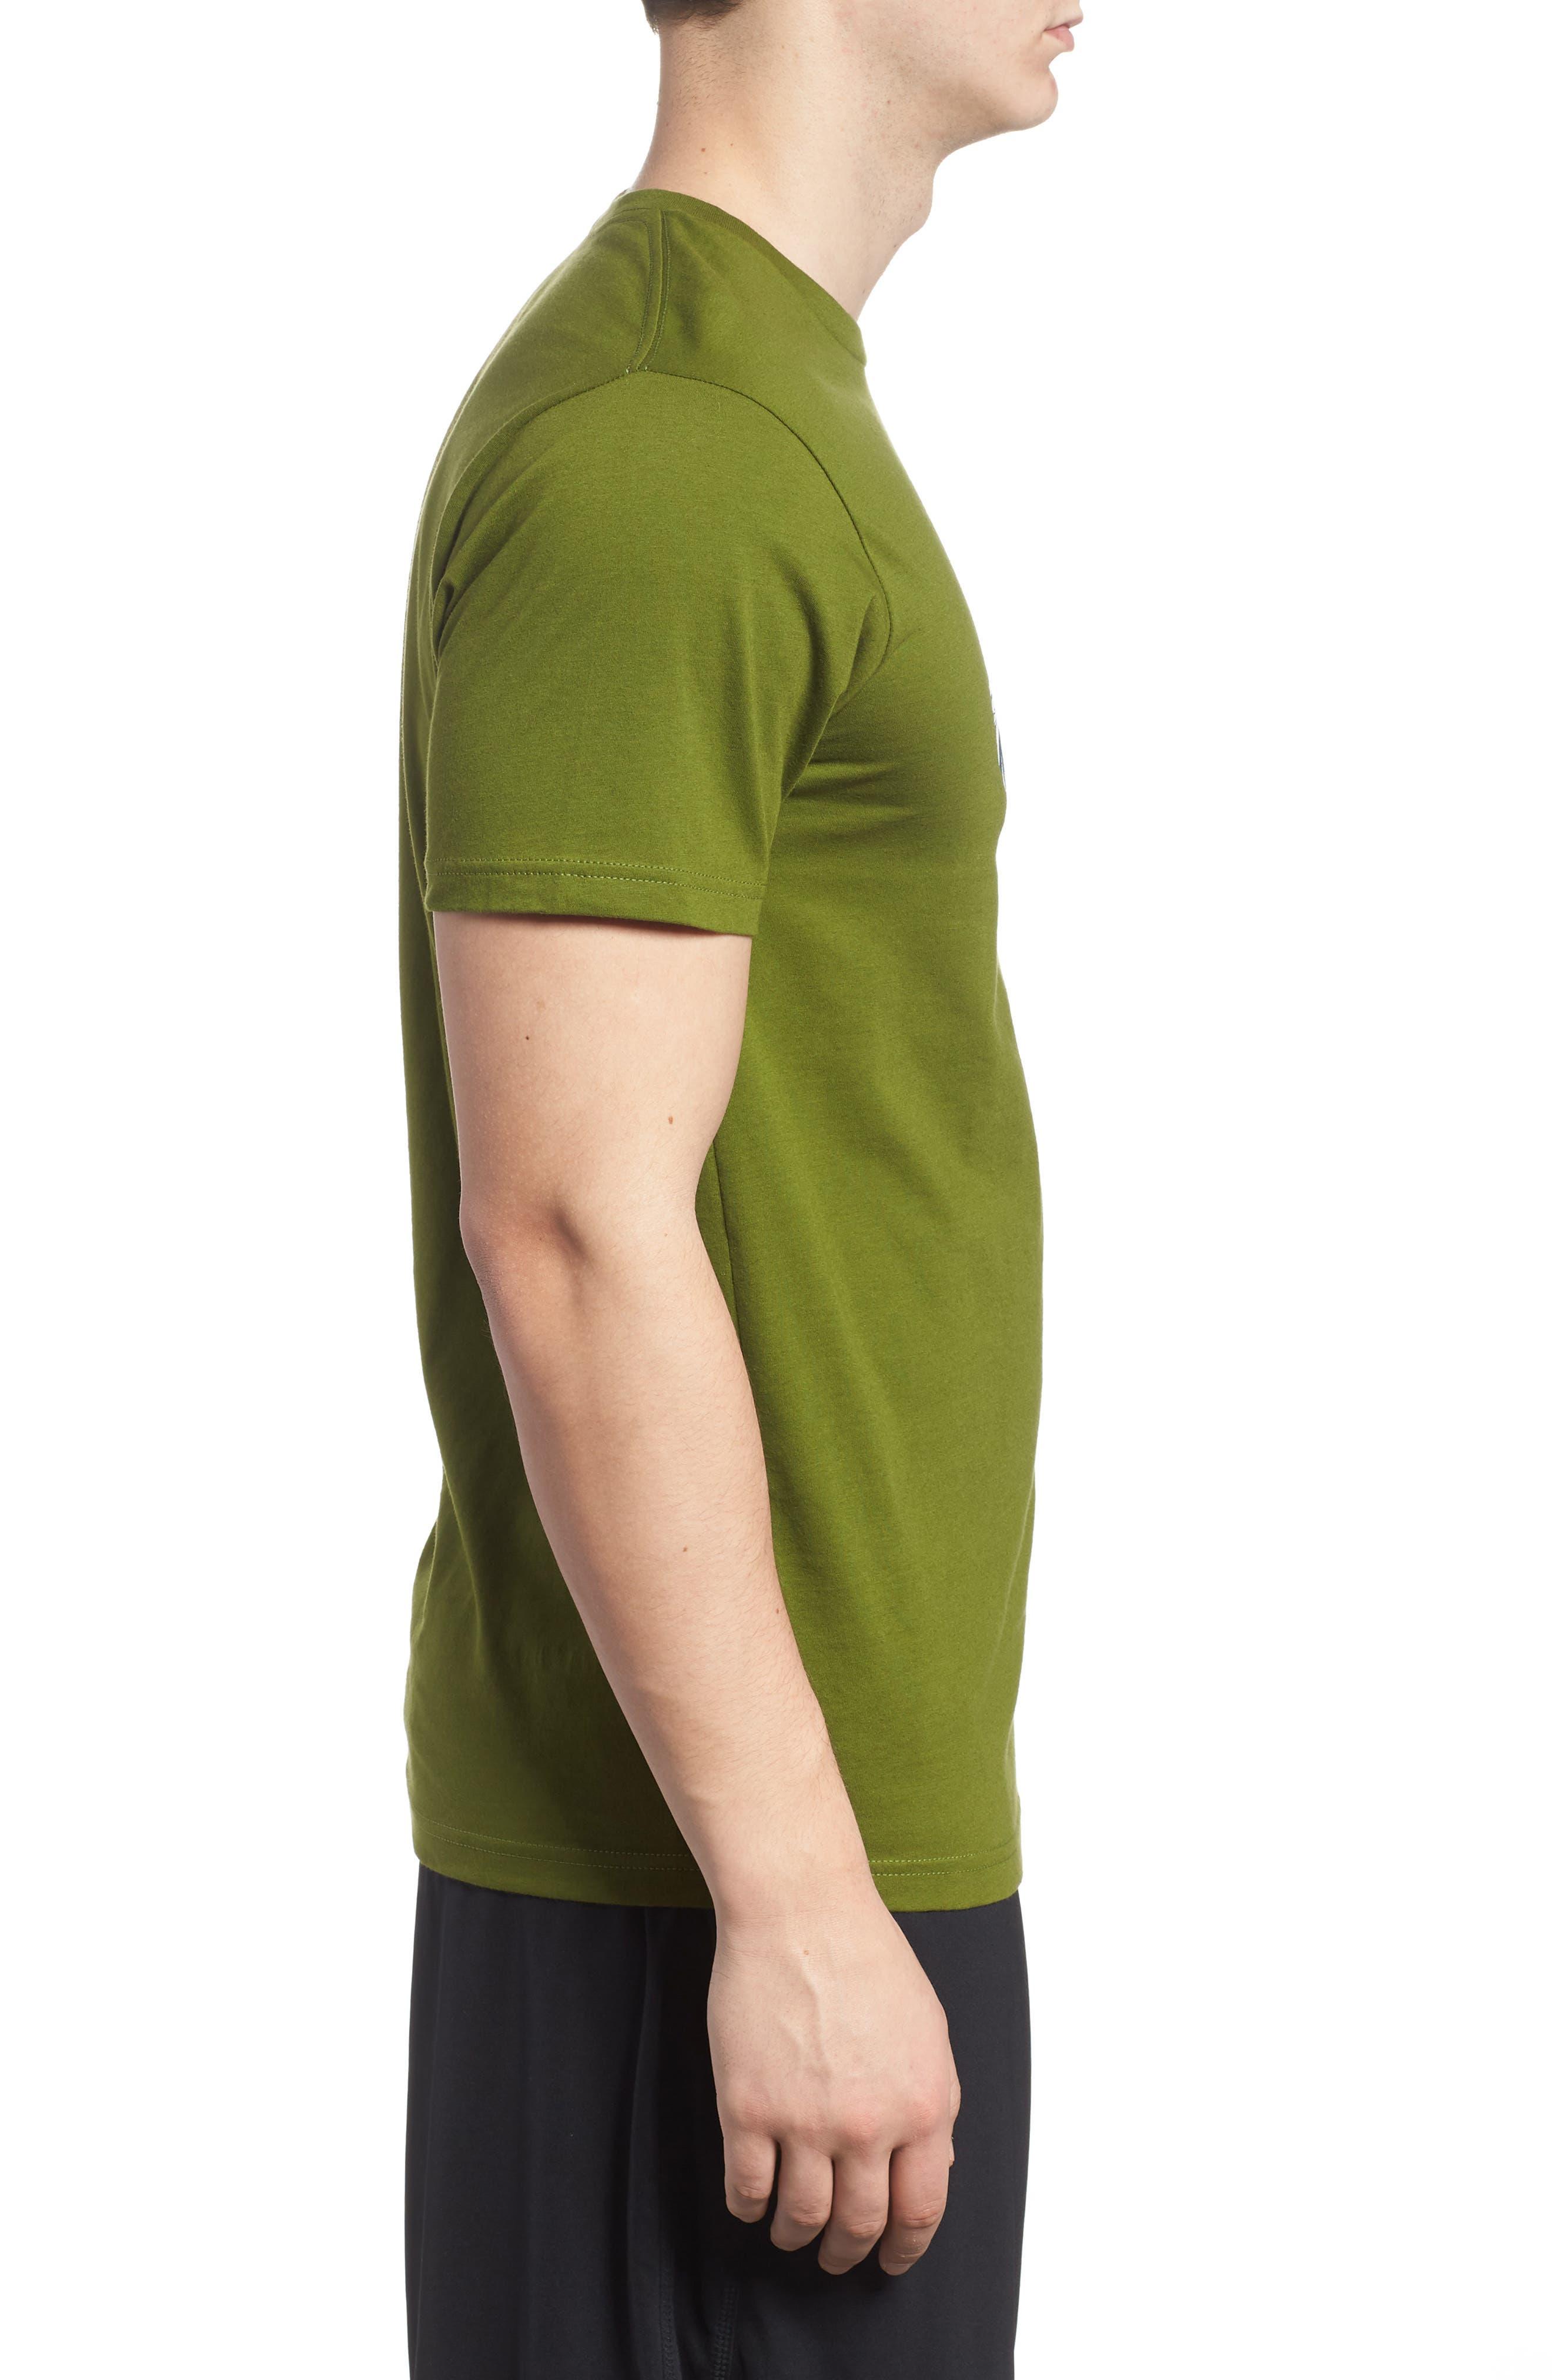 PATAGONIA,                             Oily Olas Slim Fit Organic Cotton T-Shirt,                             Alternate thumbnail 3, color,                             300